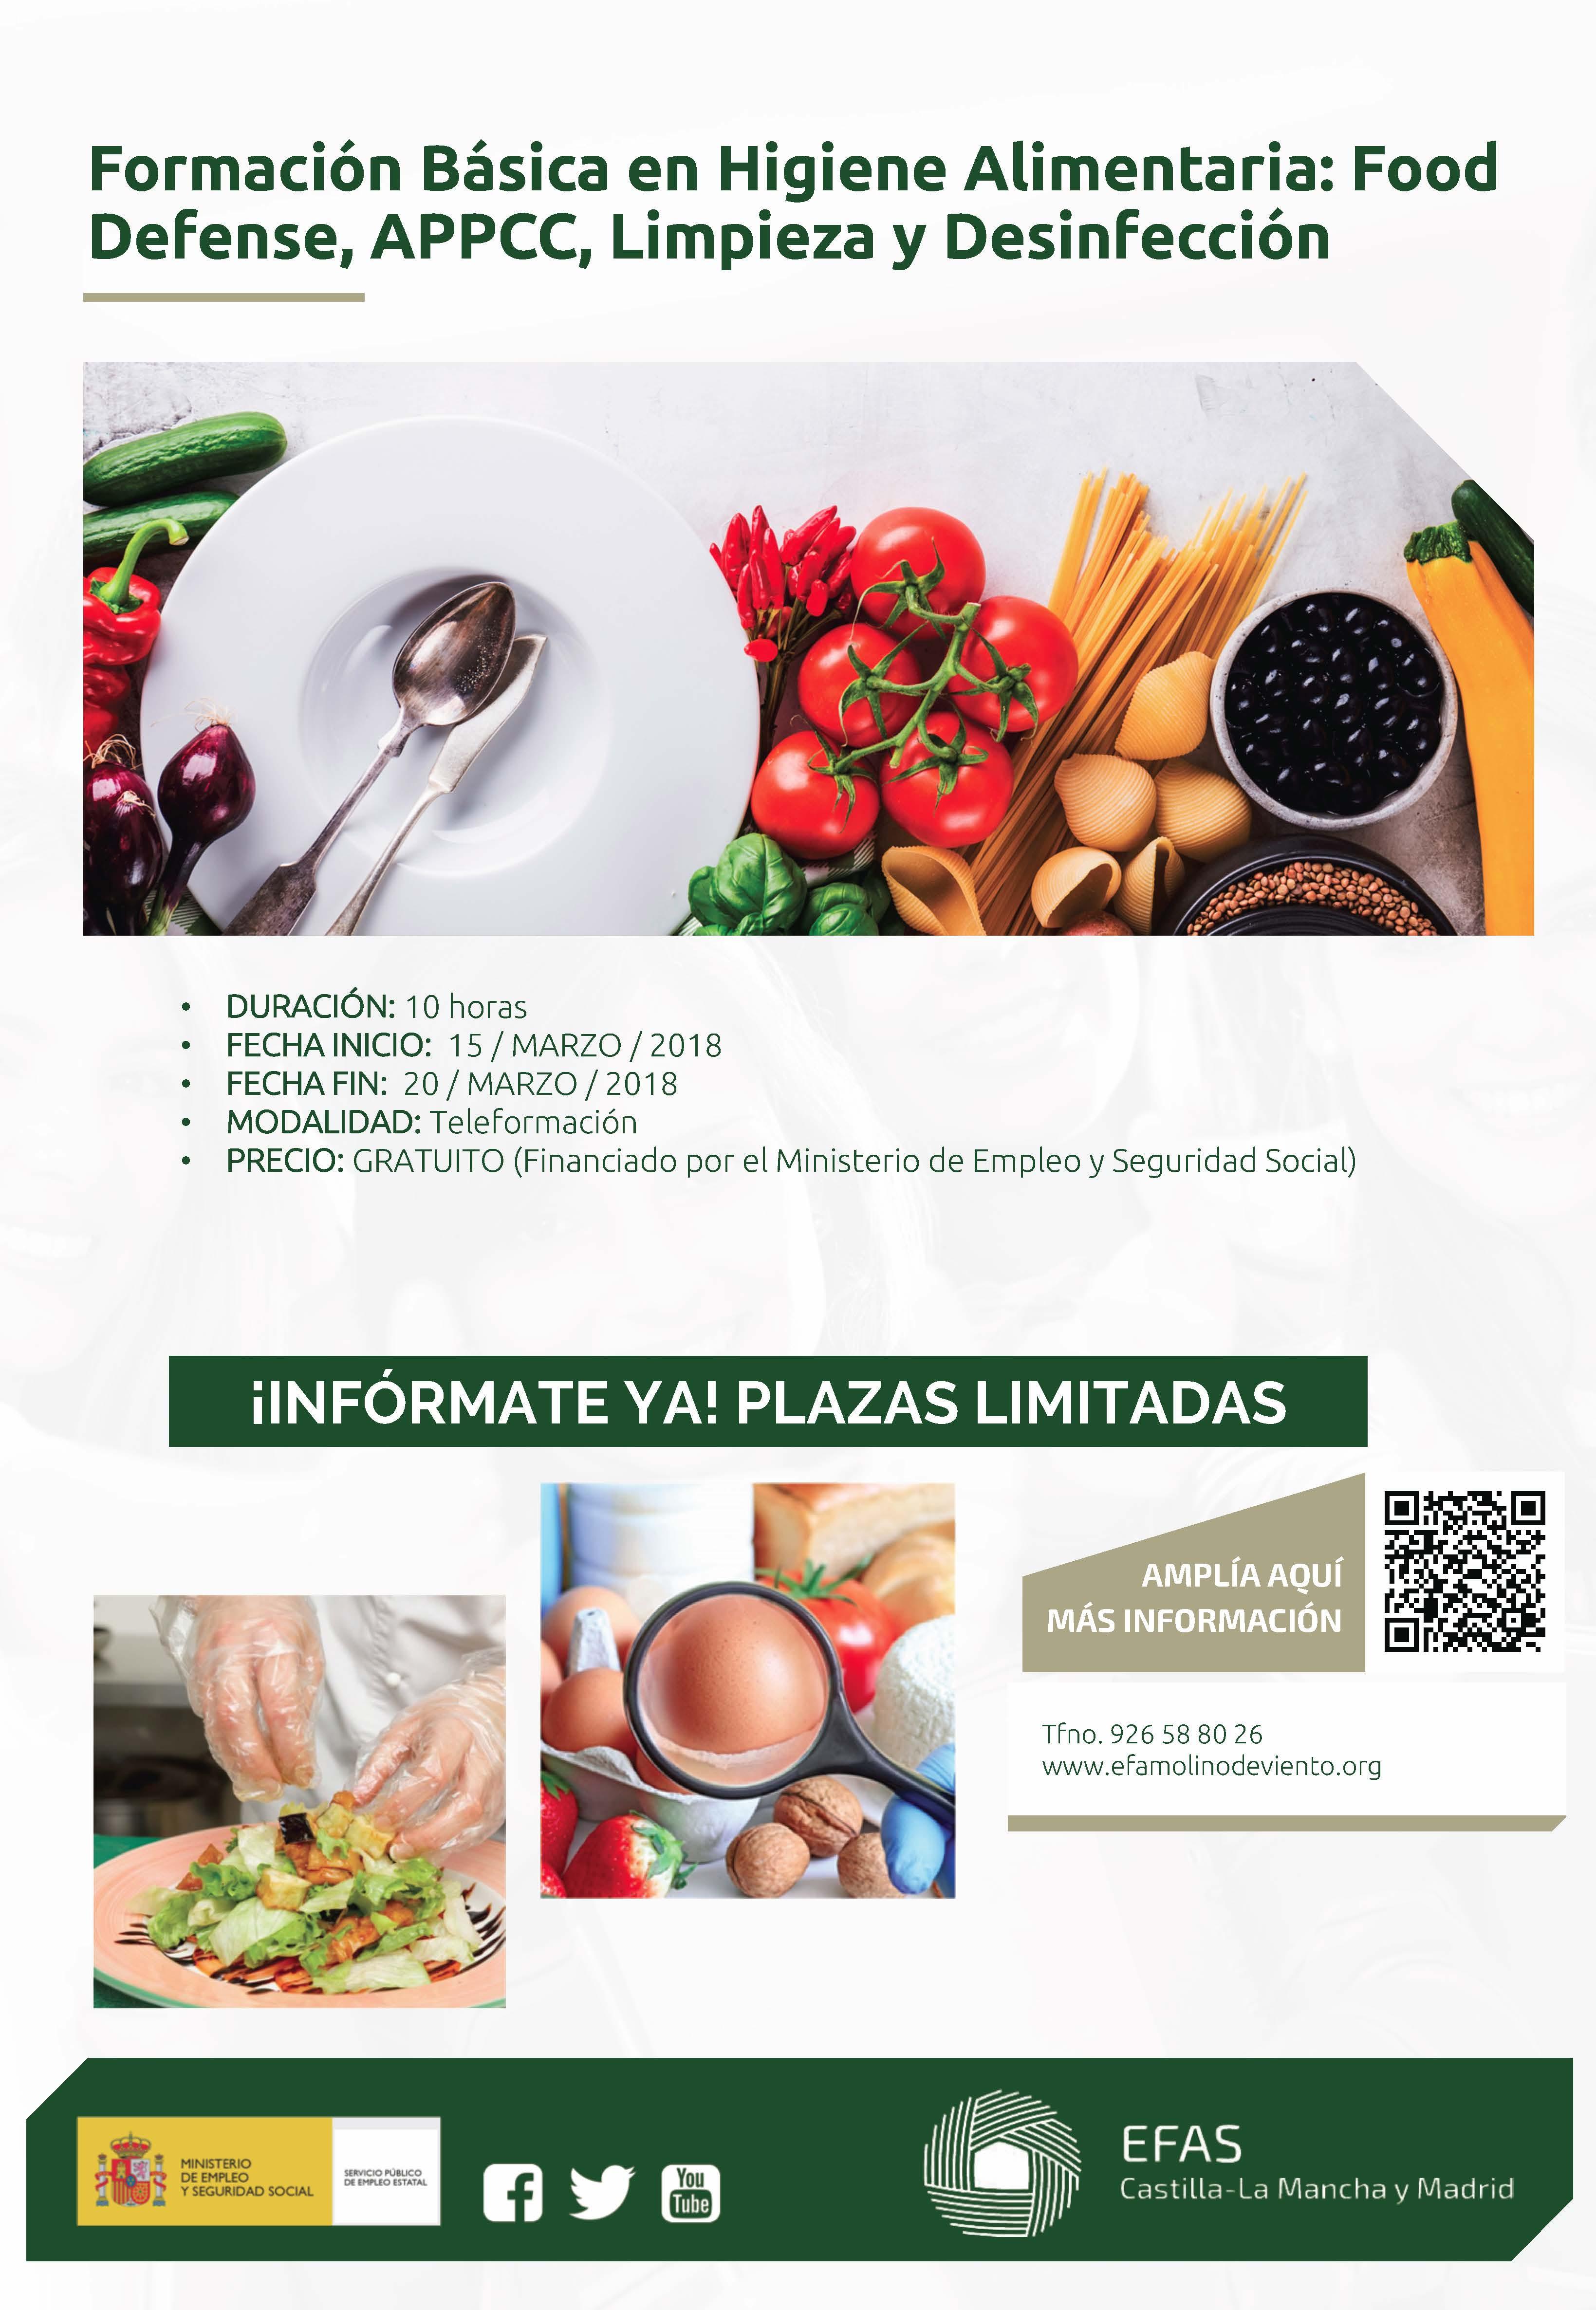 02-formacion-basica-higiene-alimentaria-01